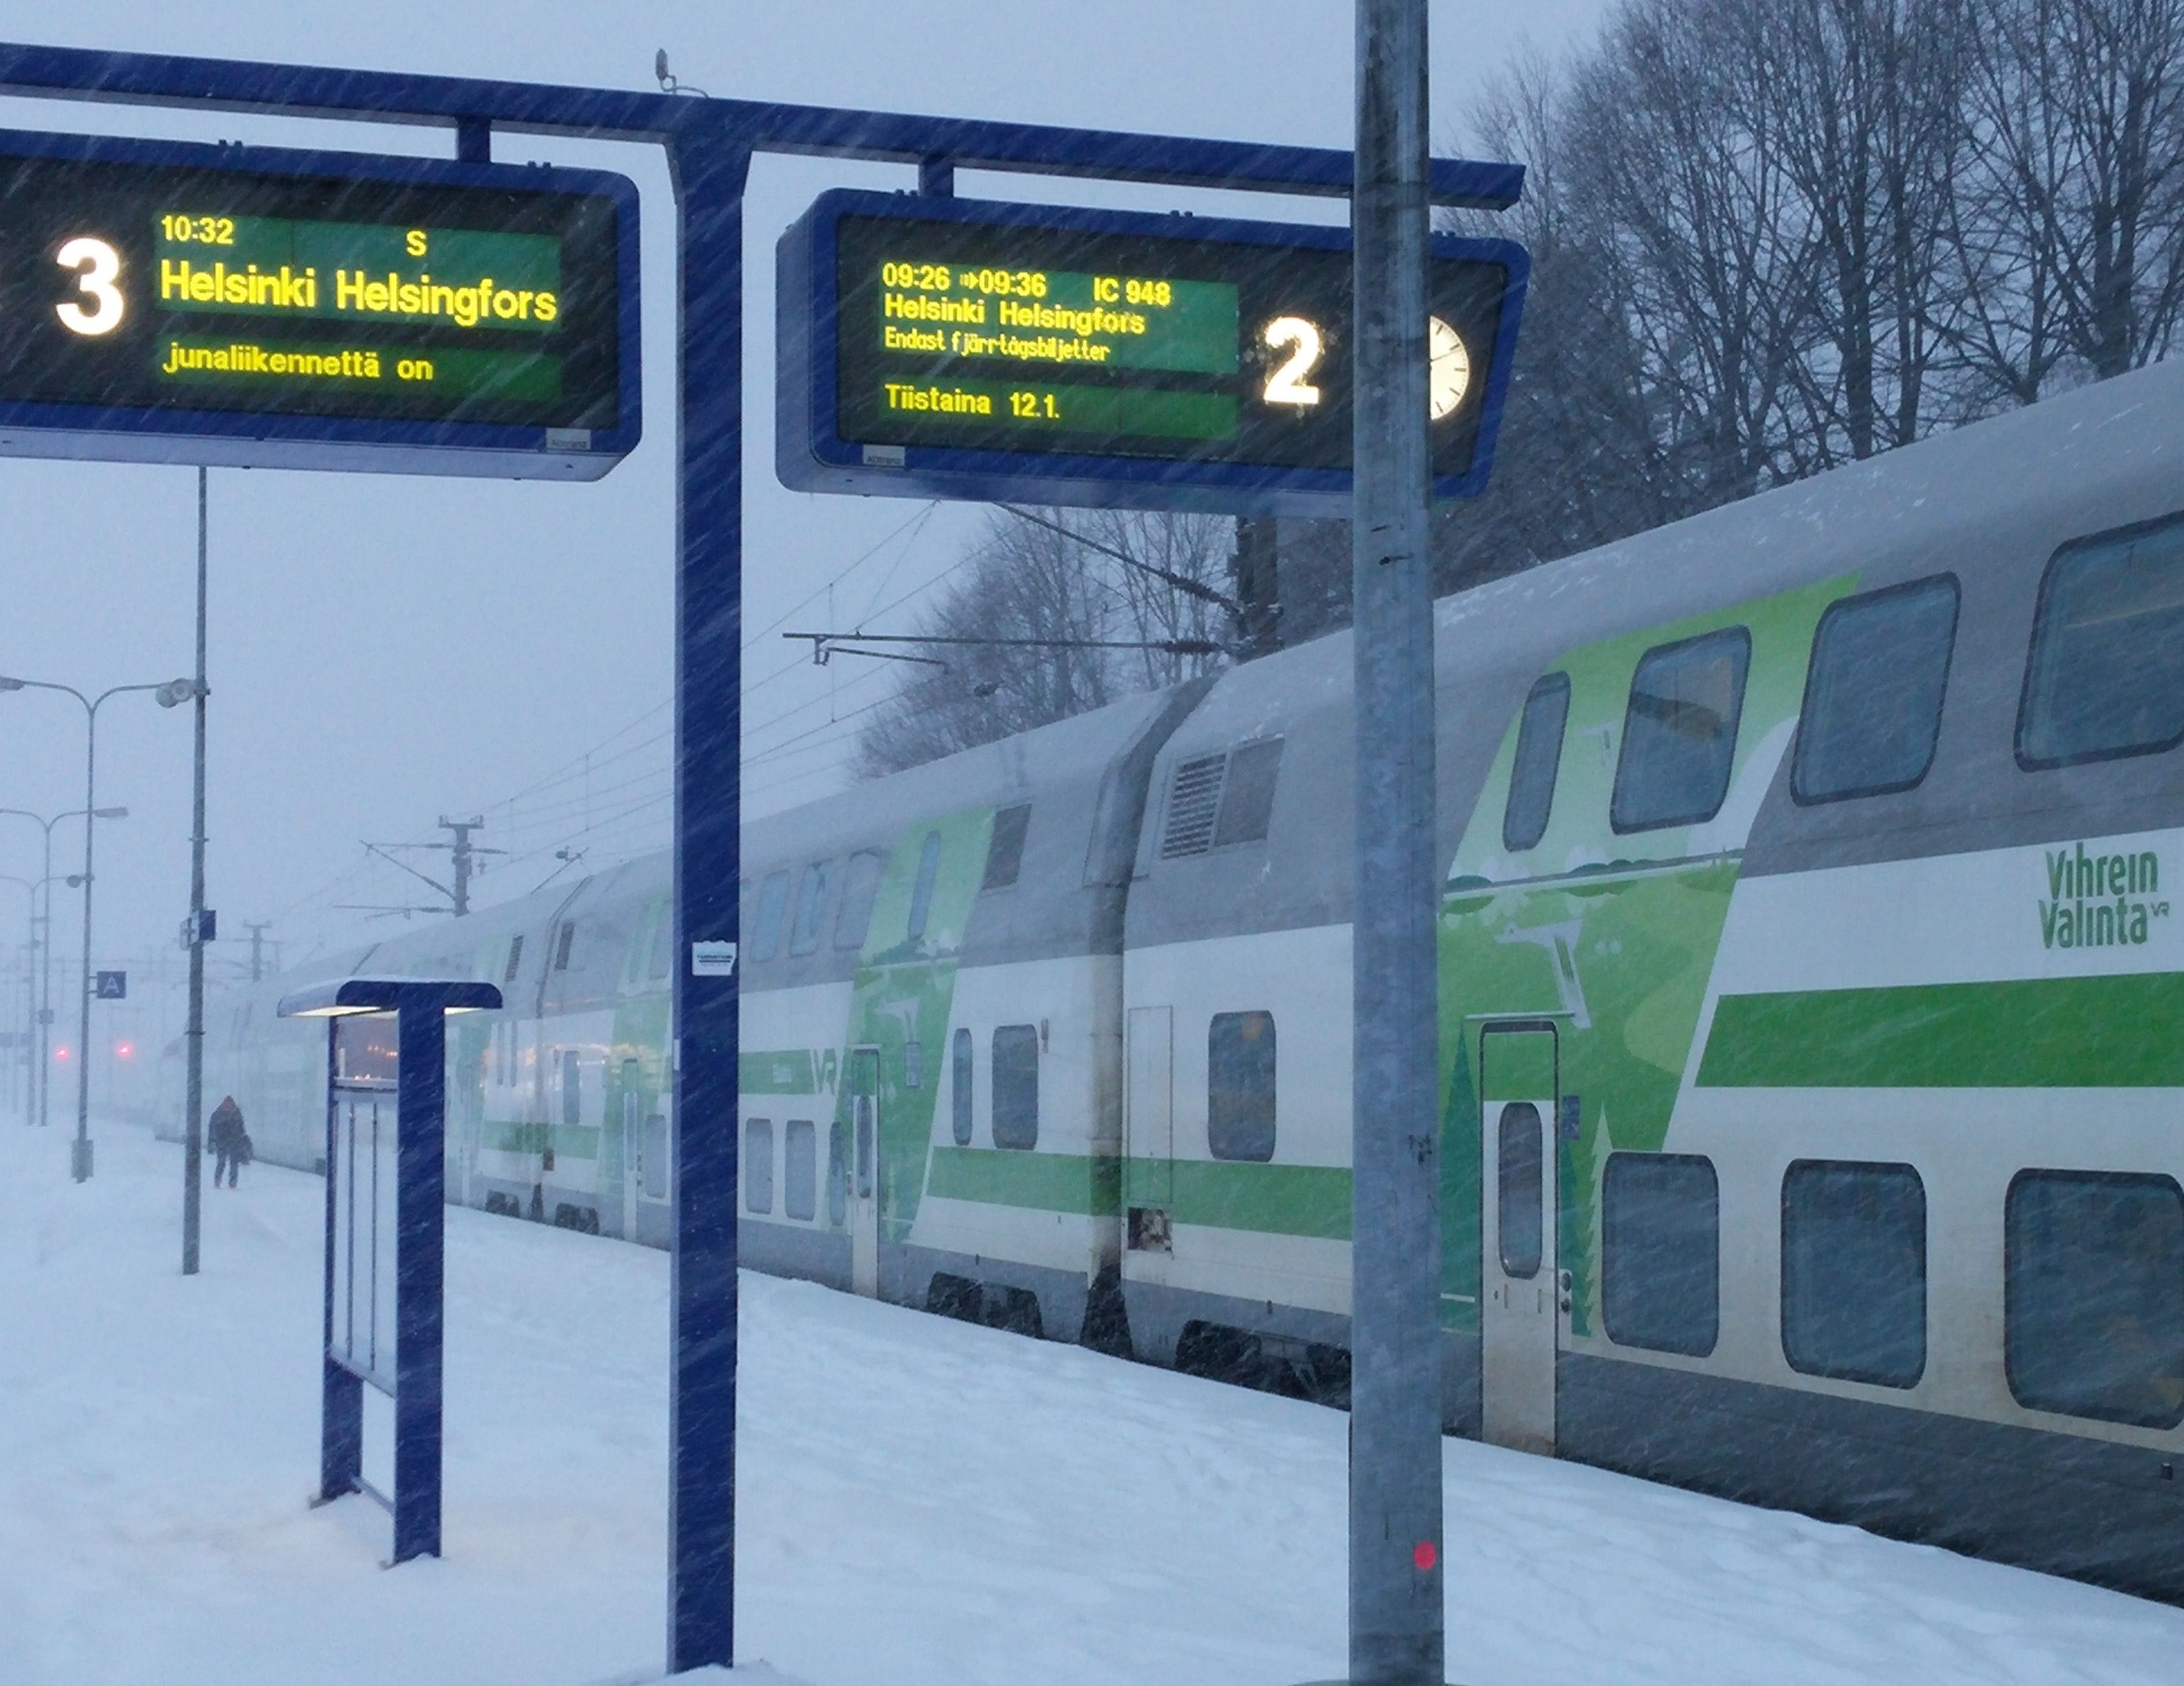 Kirkkonummi Helsinki Juna